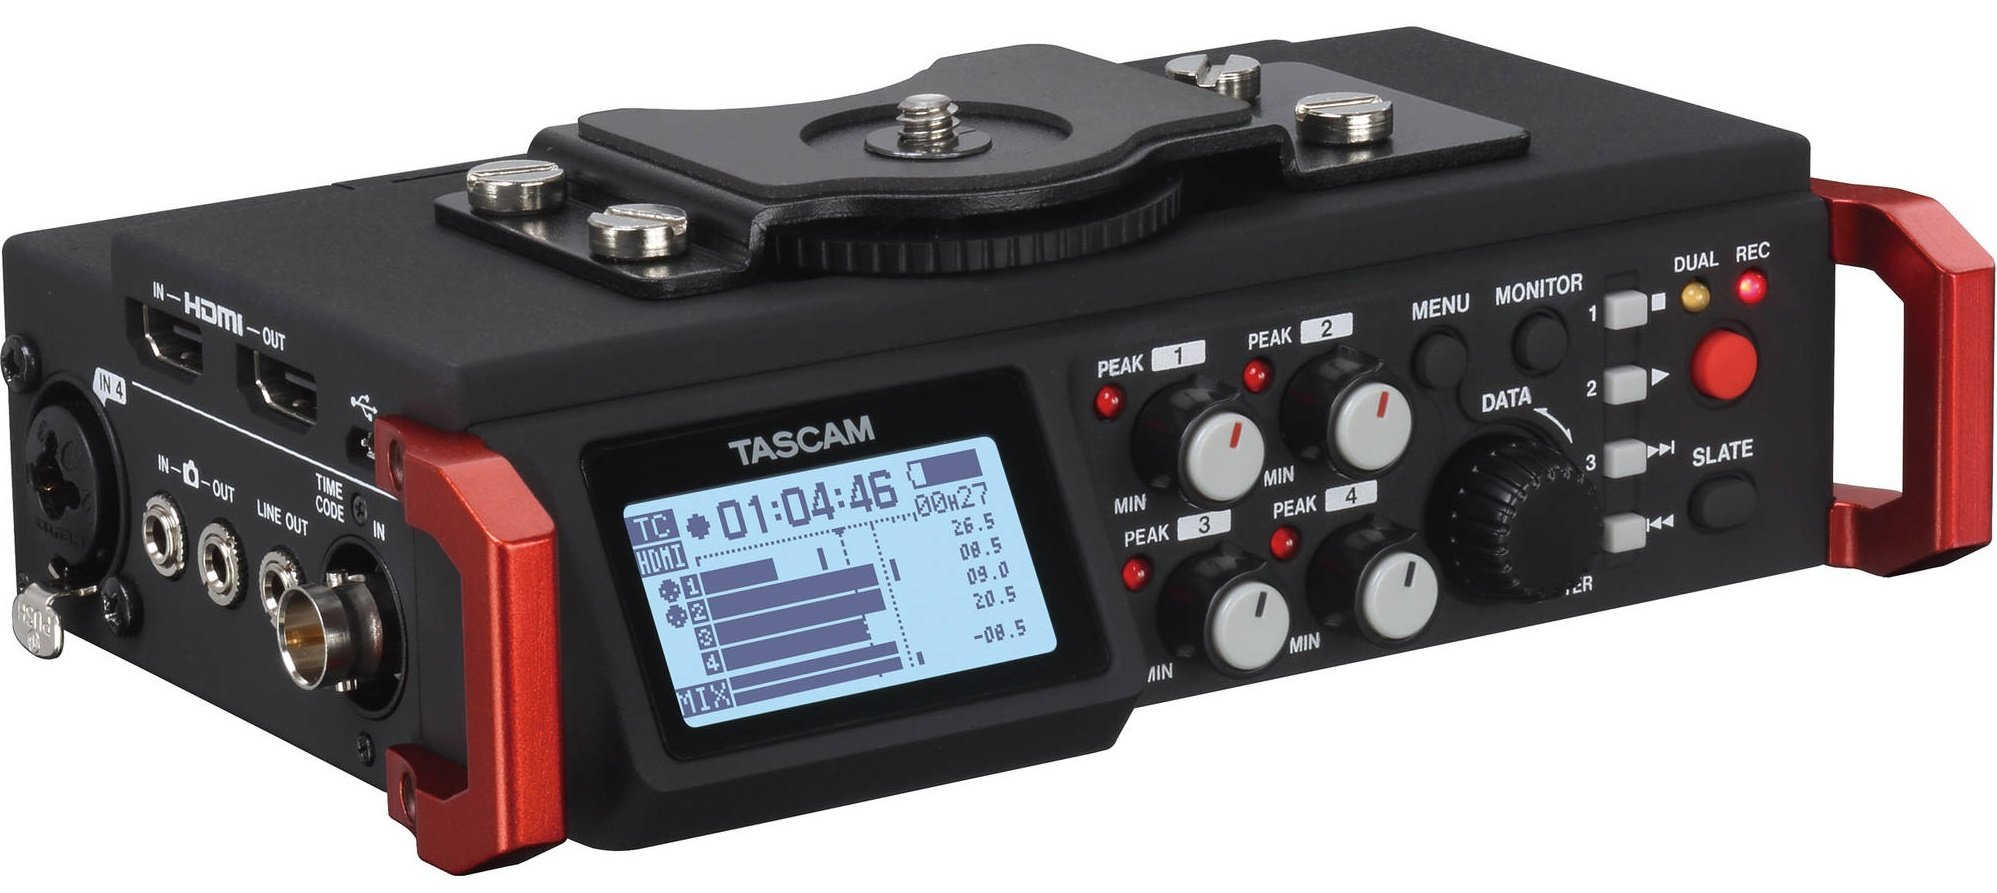 TASCAM DR-701D Šest stopový audio rekordér do terénu